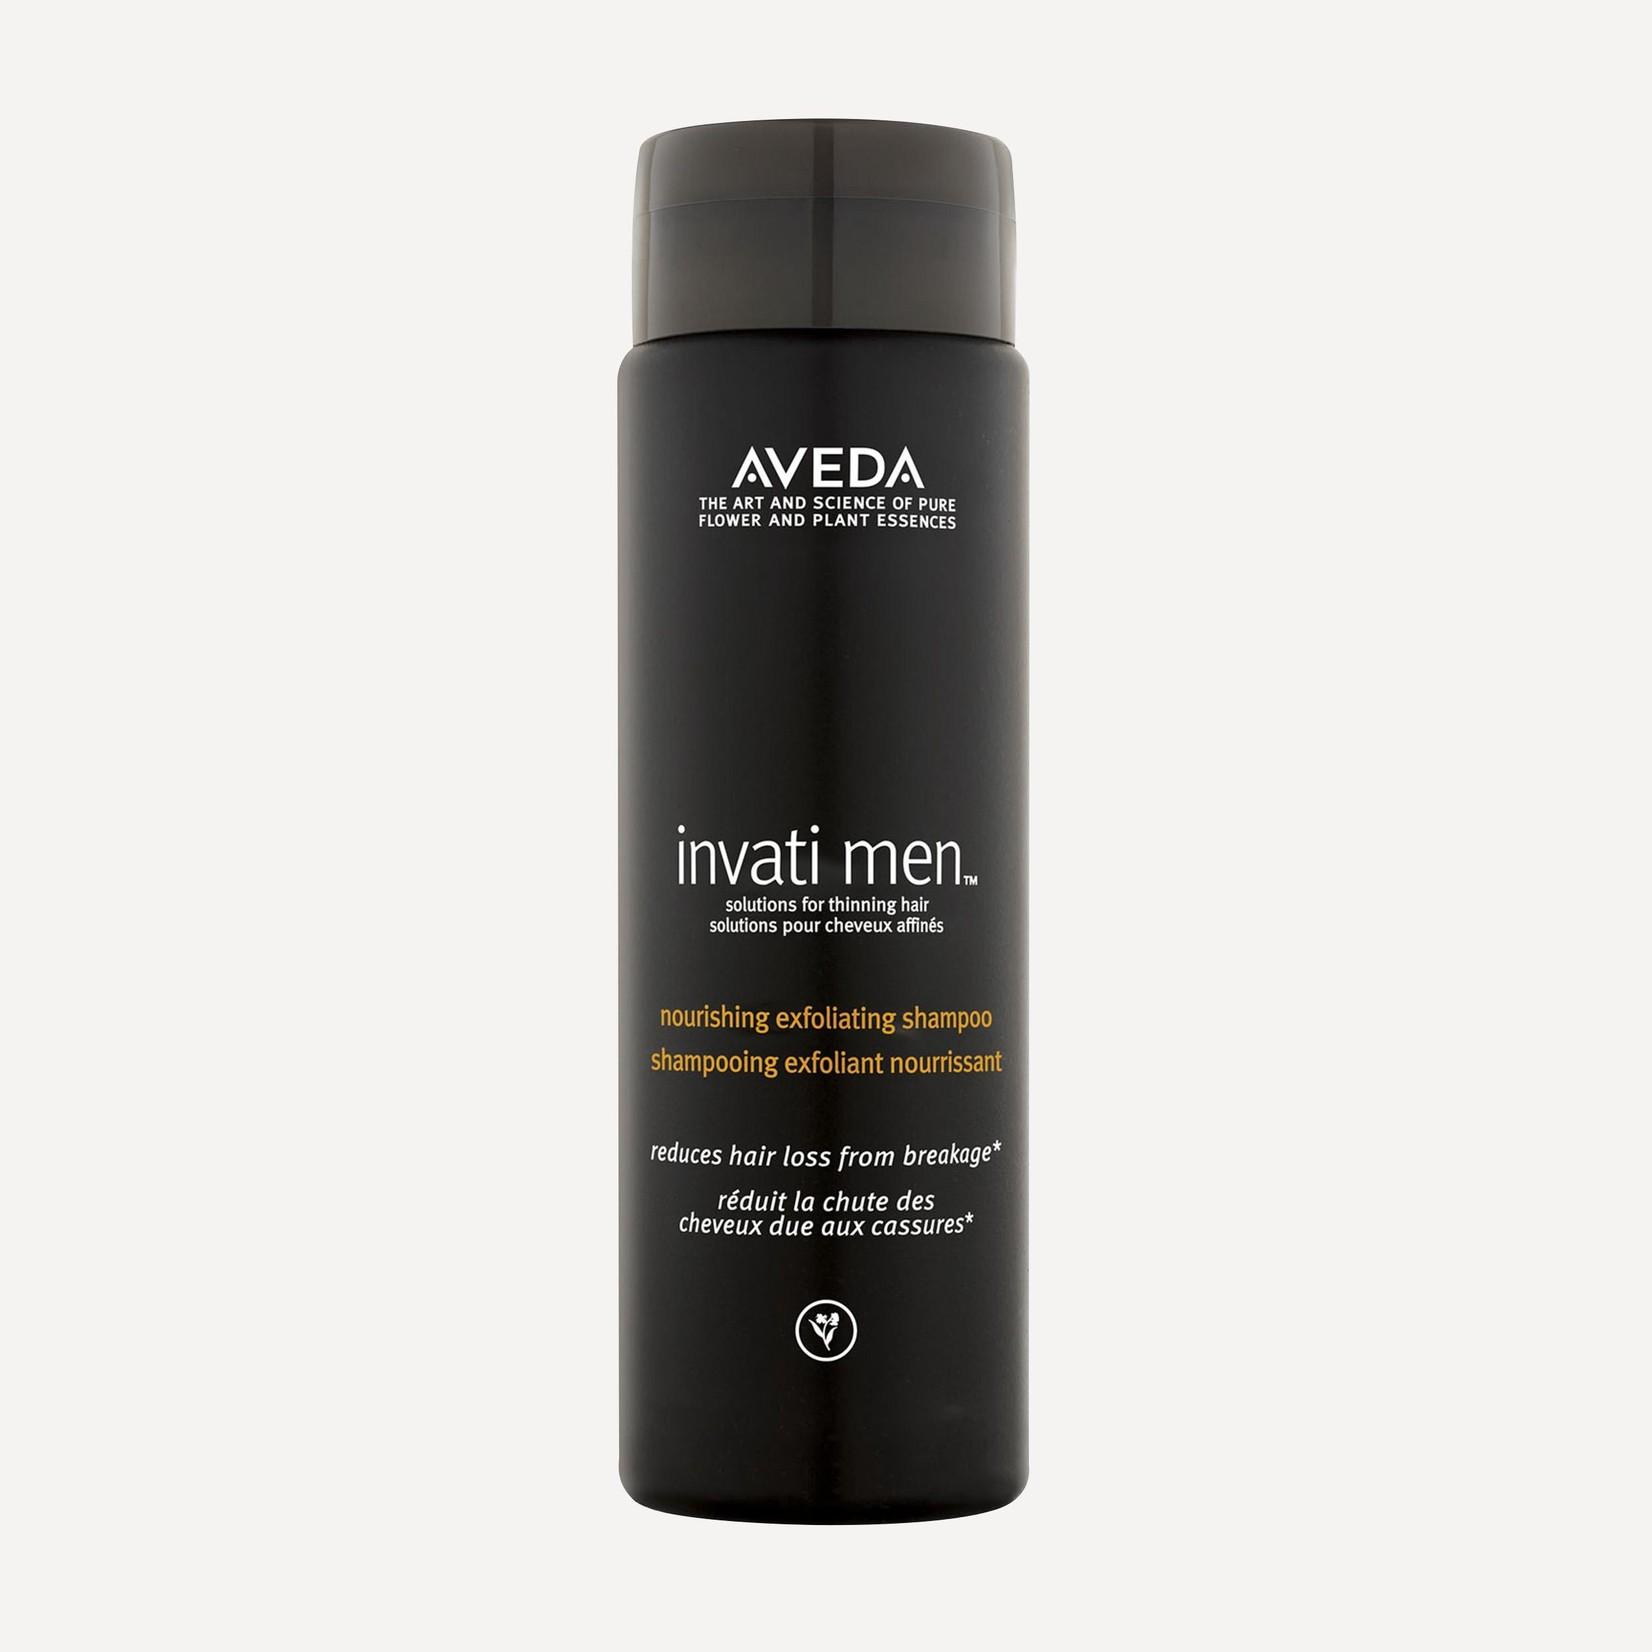 AVEDA Invati Men™ Nourishing Exfoliating Shampoo